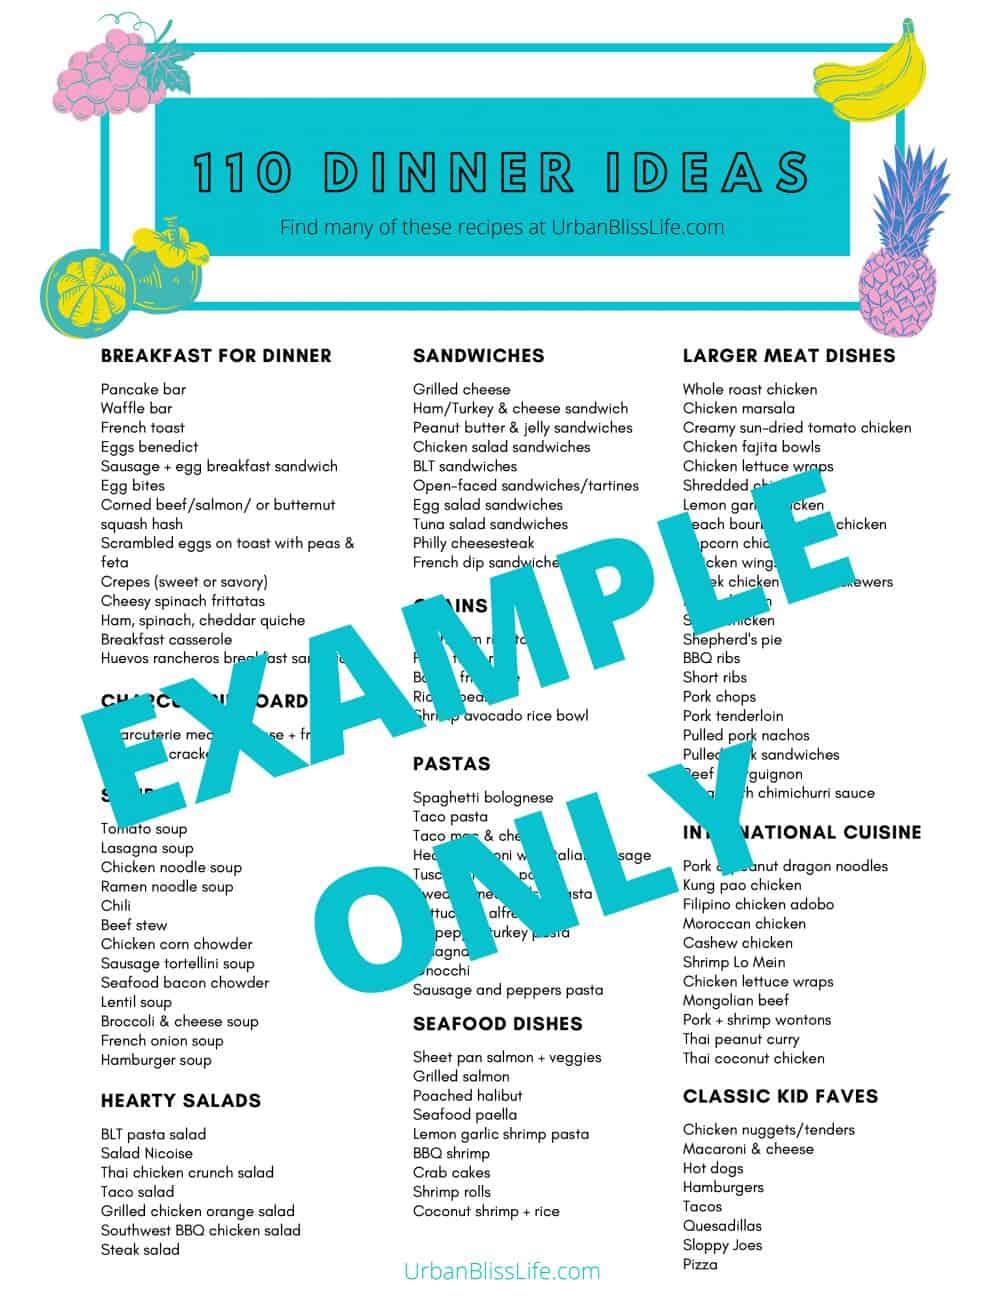 110 Family Friendly Dinner Ideas printable PDF